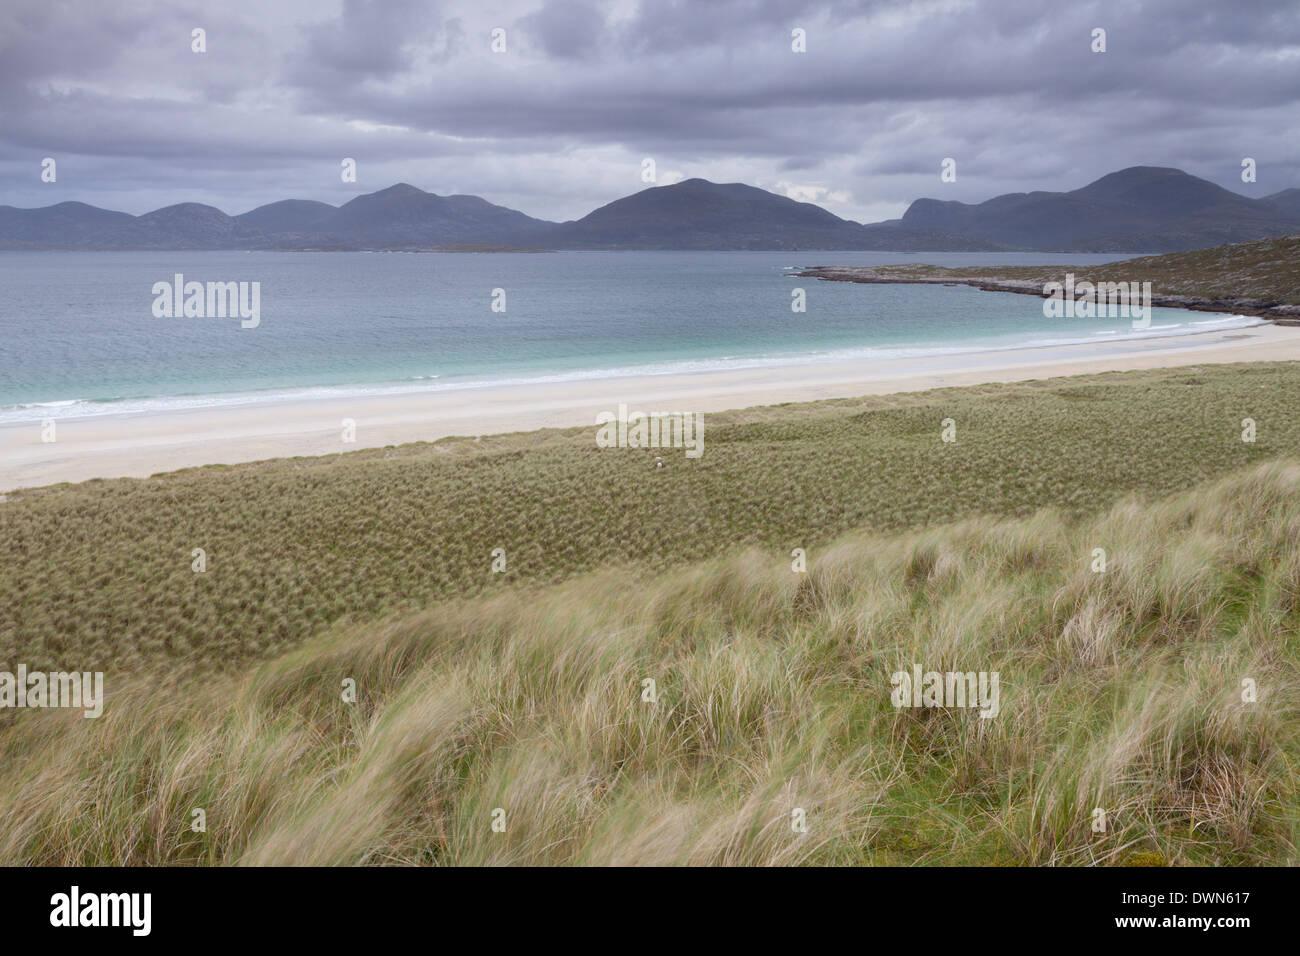 The stunning dunes and beach at Luskentyre, Isle of Harris, Outer Hebrides, Scotland, United Kingdom, Europe - Stock Image